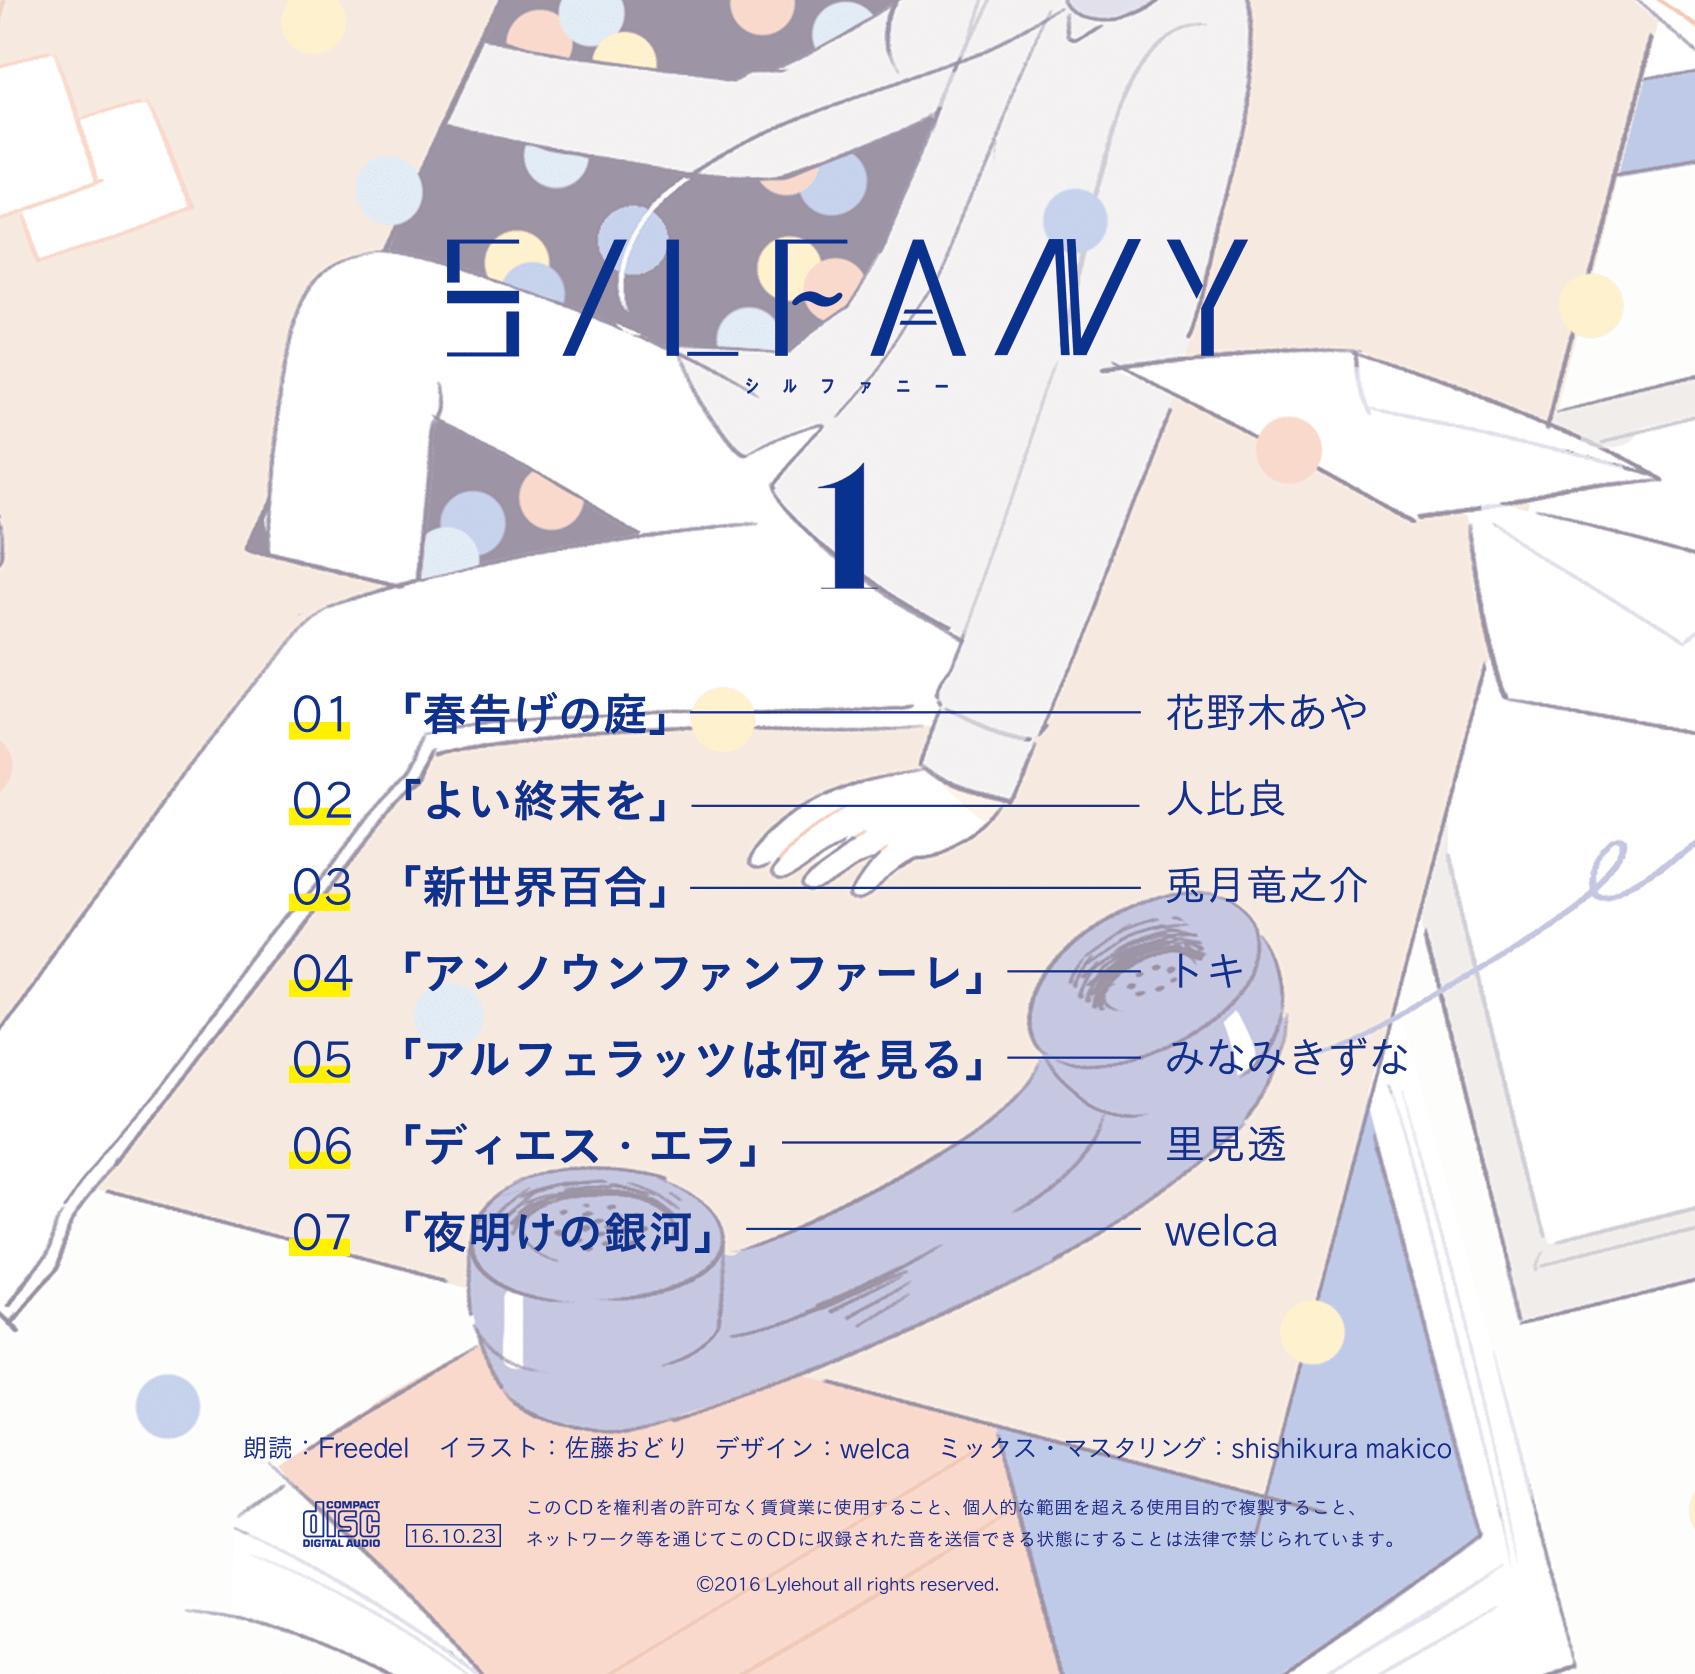 SILFANY vol.1 朗読CD